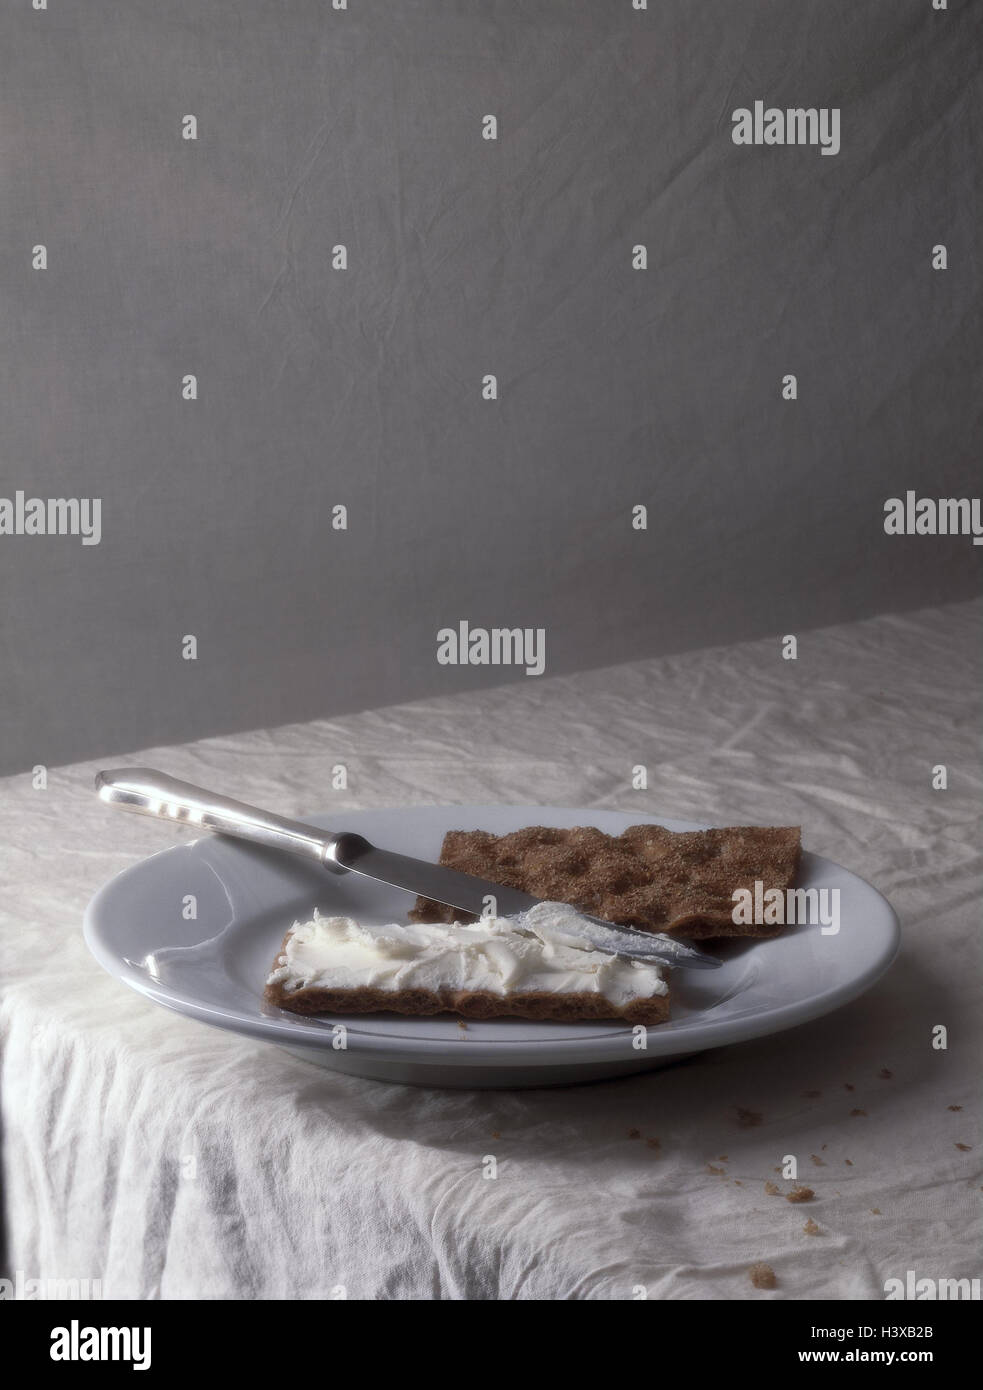 Platten Knackebrot Messer Quark Verteilt Snack Schuss Brot Diat